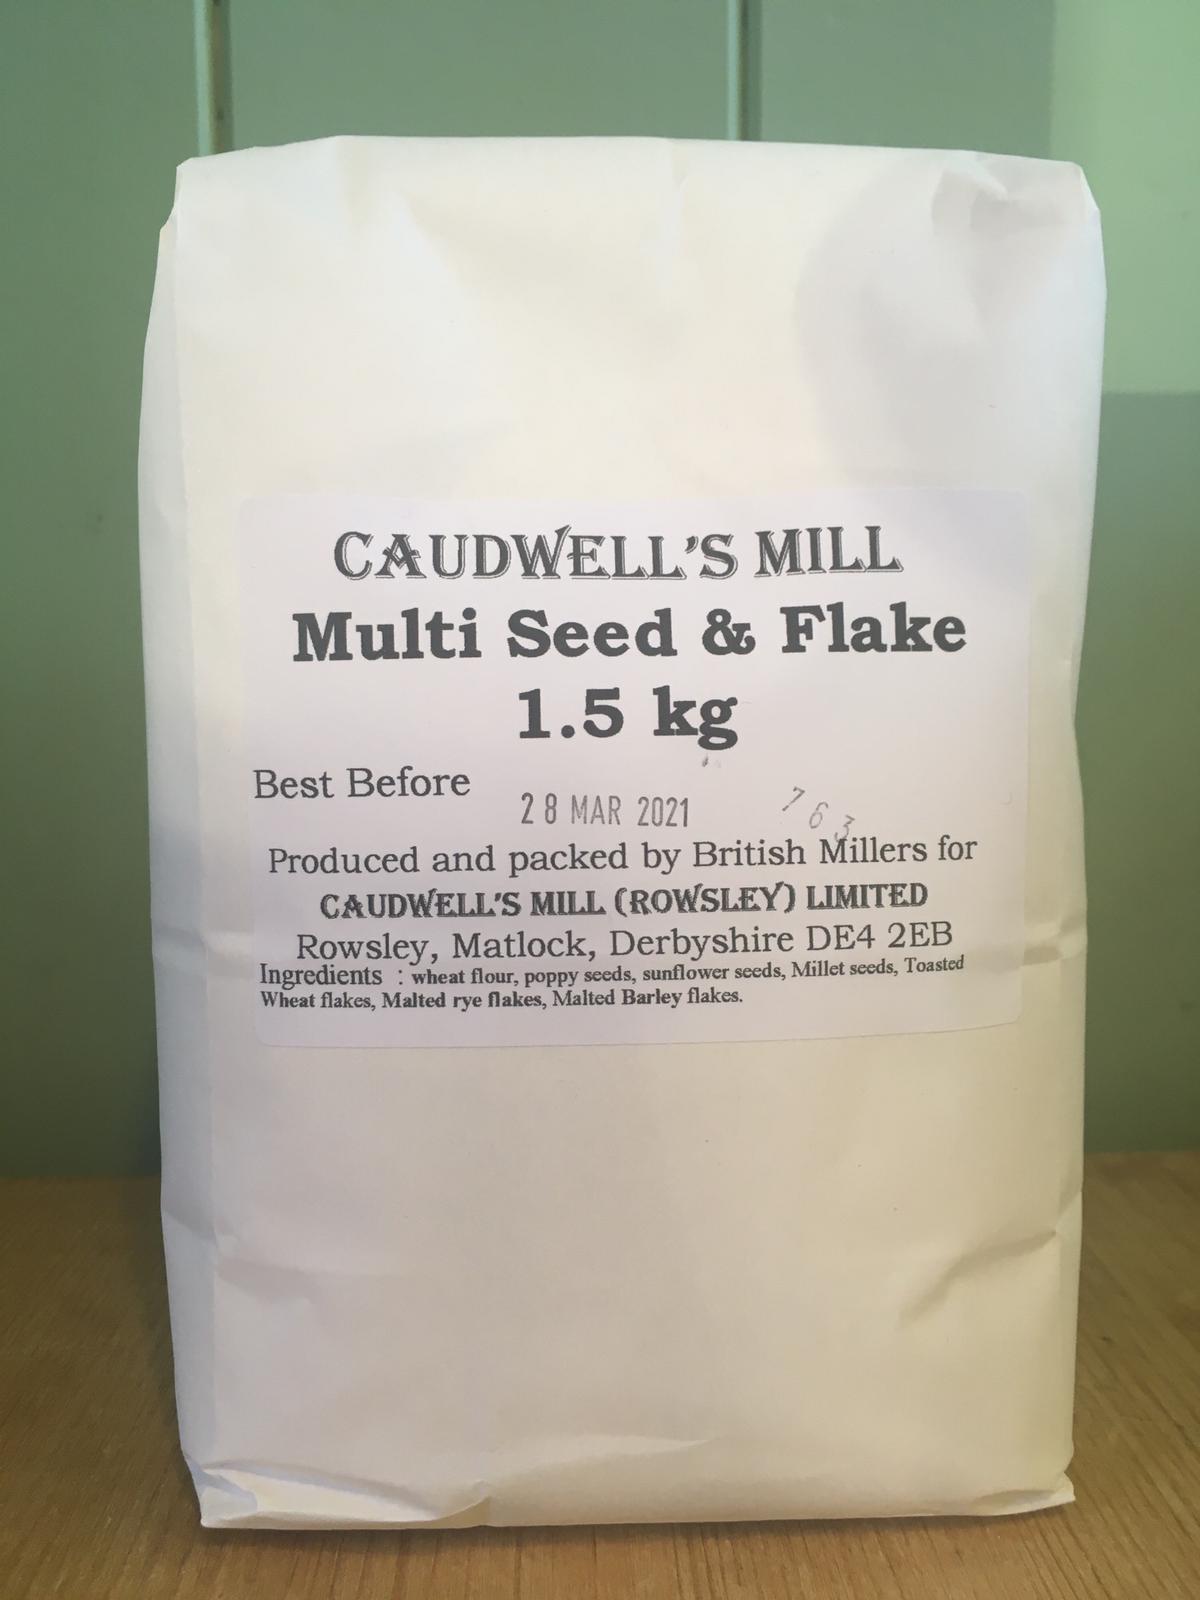 Caudwell's Mill Flour - Multi Seed & Flake Bread Flour 1.5kg